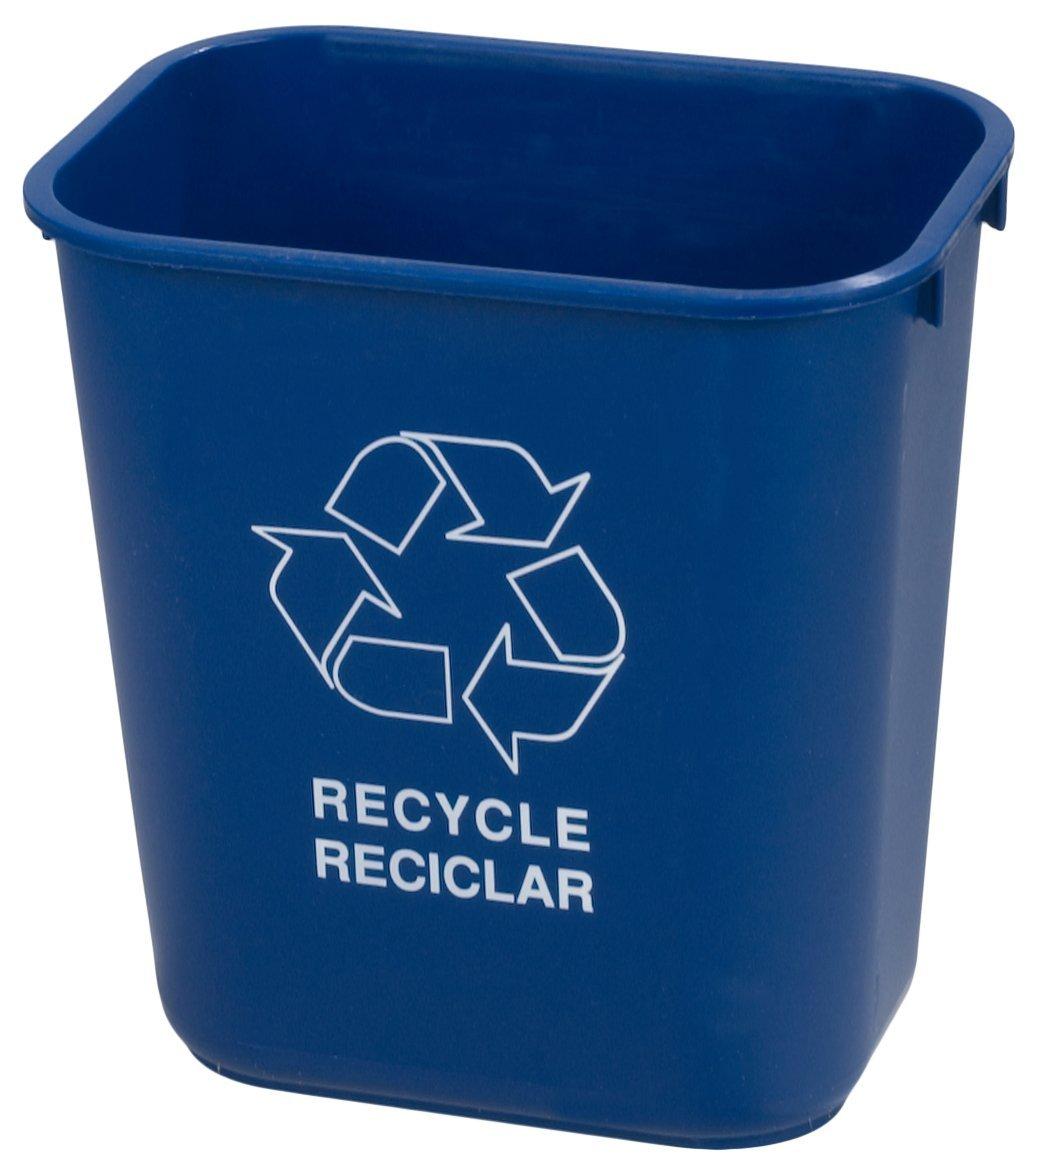 Carlisle 342928REC14 Plastic Recycle Deskside Wastebasket, 28 Quart, Blue